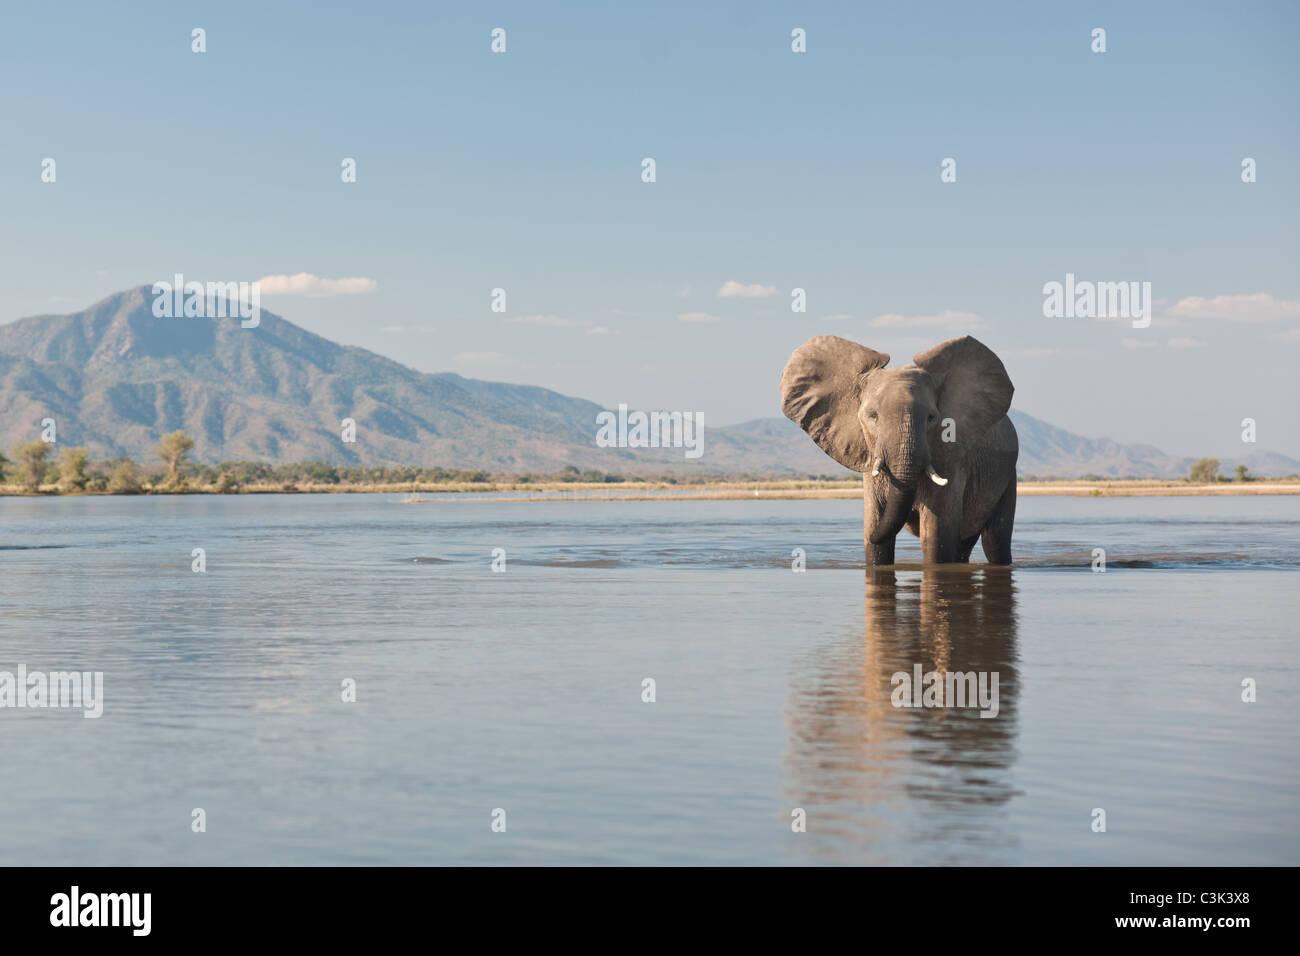 A bull elephant walks through the Zambezi river in Mana Pools National Park - Stock Image